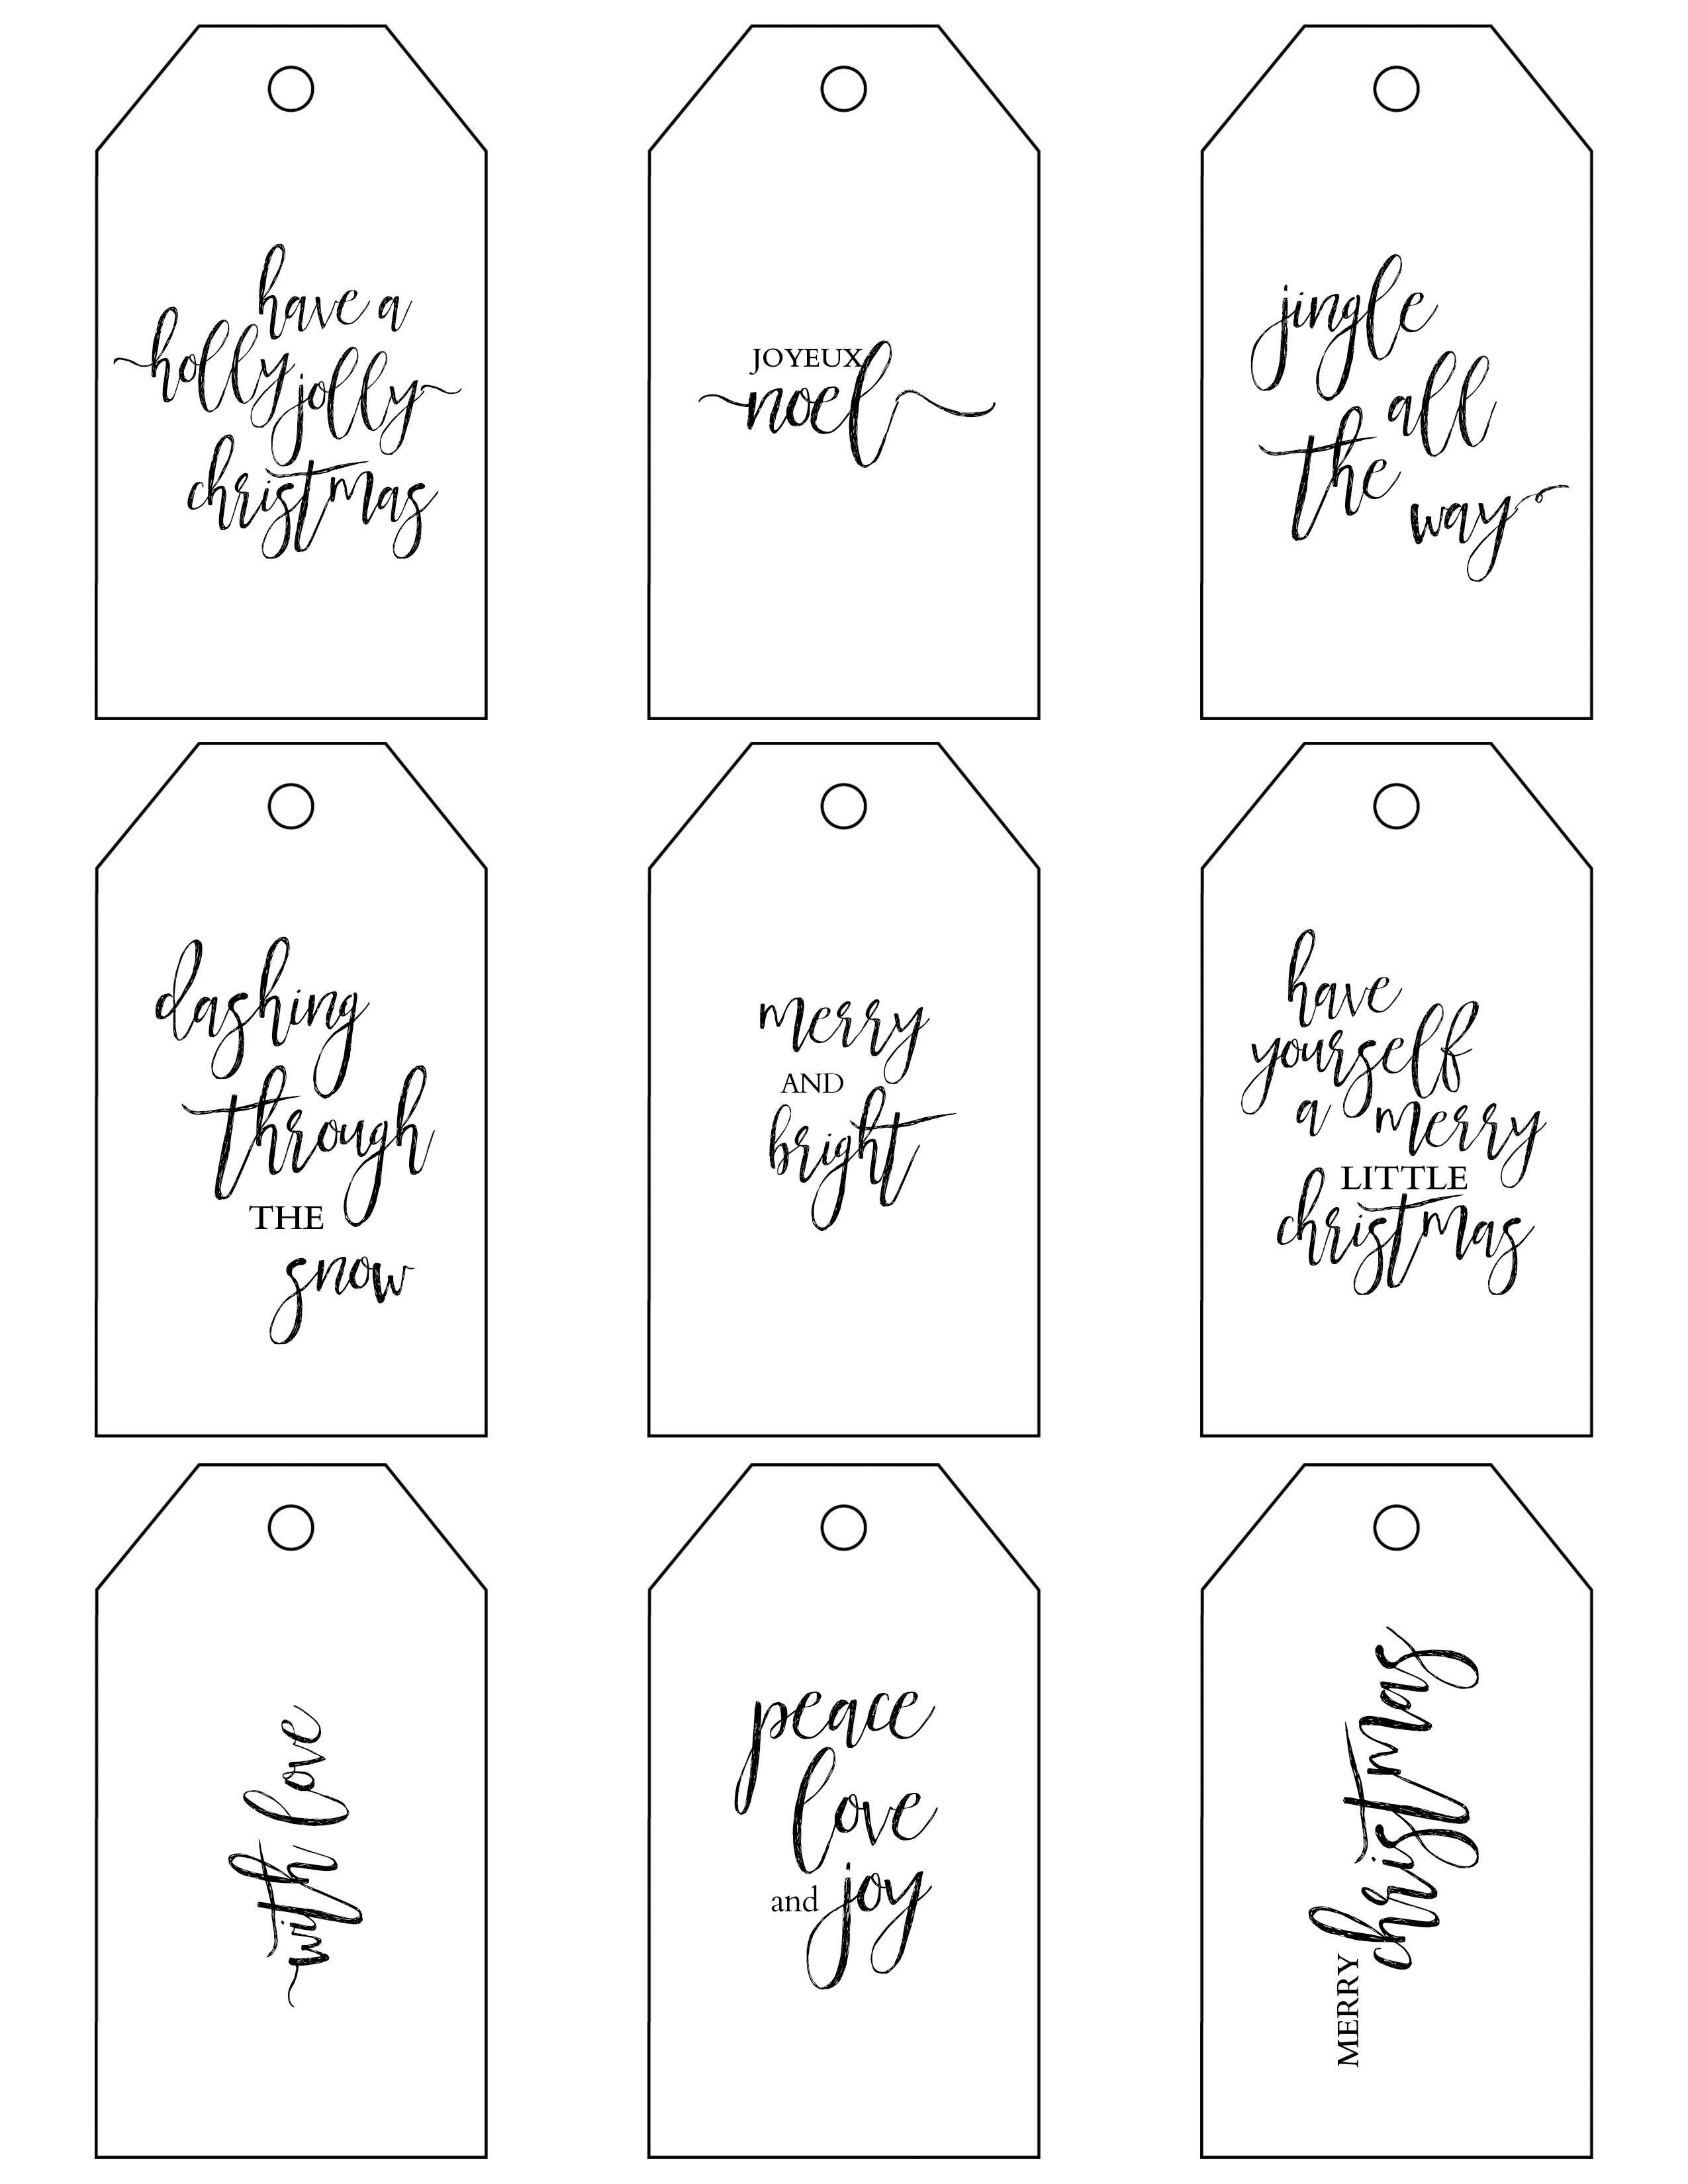 Printable Christmas Gift Tags Make Holiday Wrapping Simple - Free Printable Holiday Gift Labels